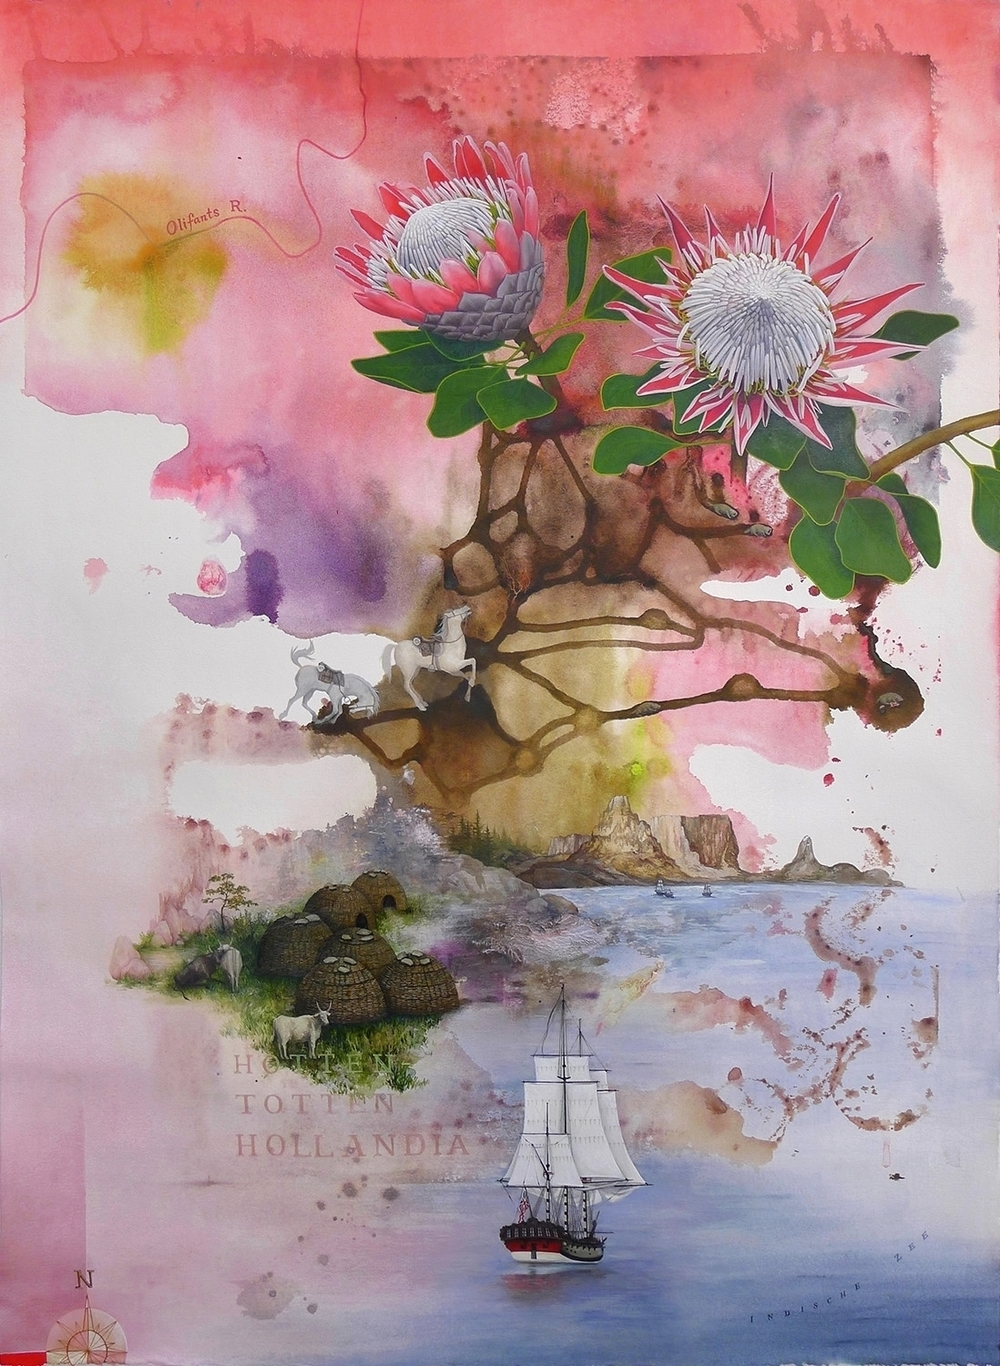 Hotten Totten Hollandia,  2014, Acrylic over Monoprint on Paper, 77 cm x 55.5 cm